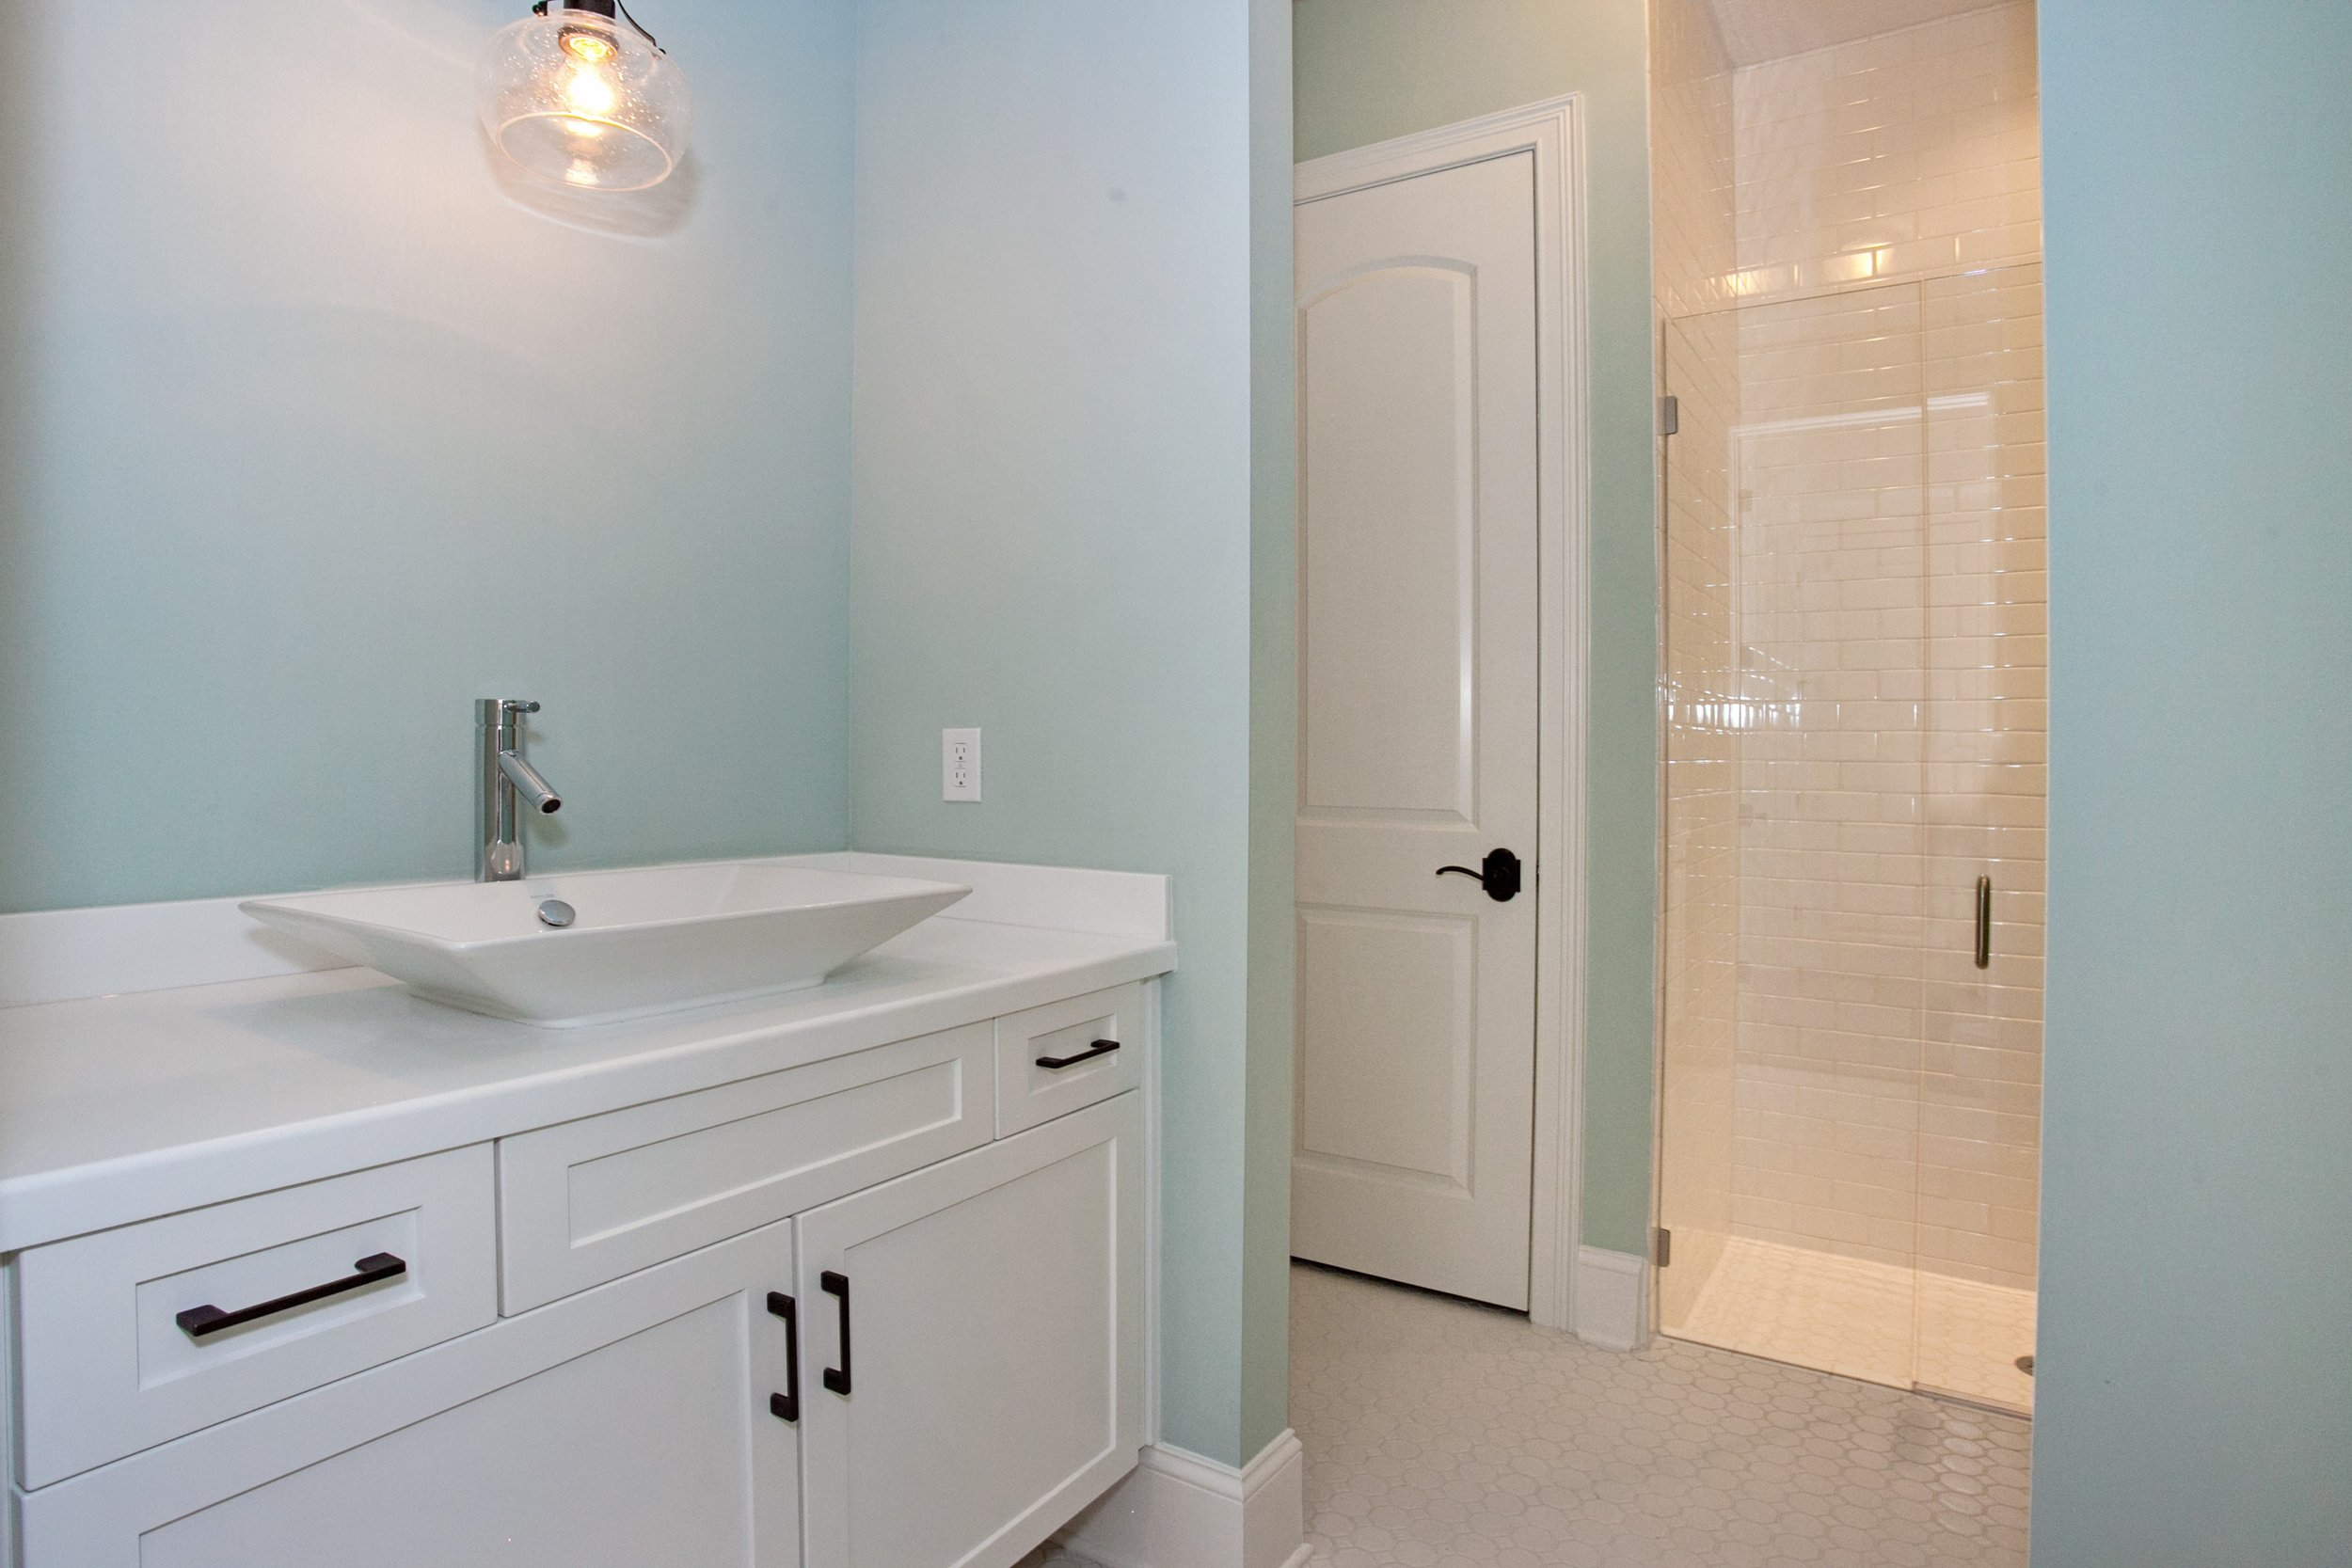 042_Bathroom.jpg